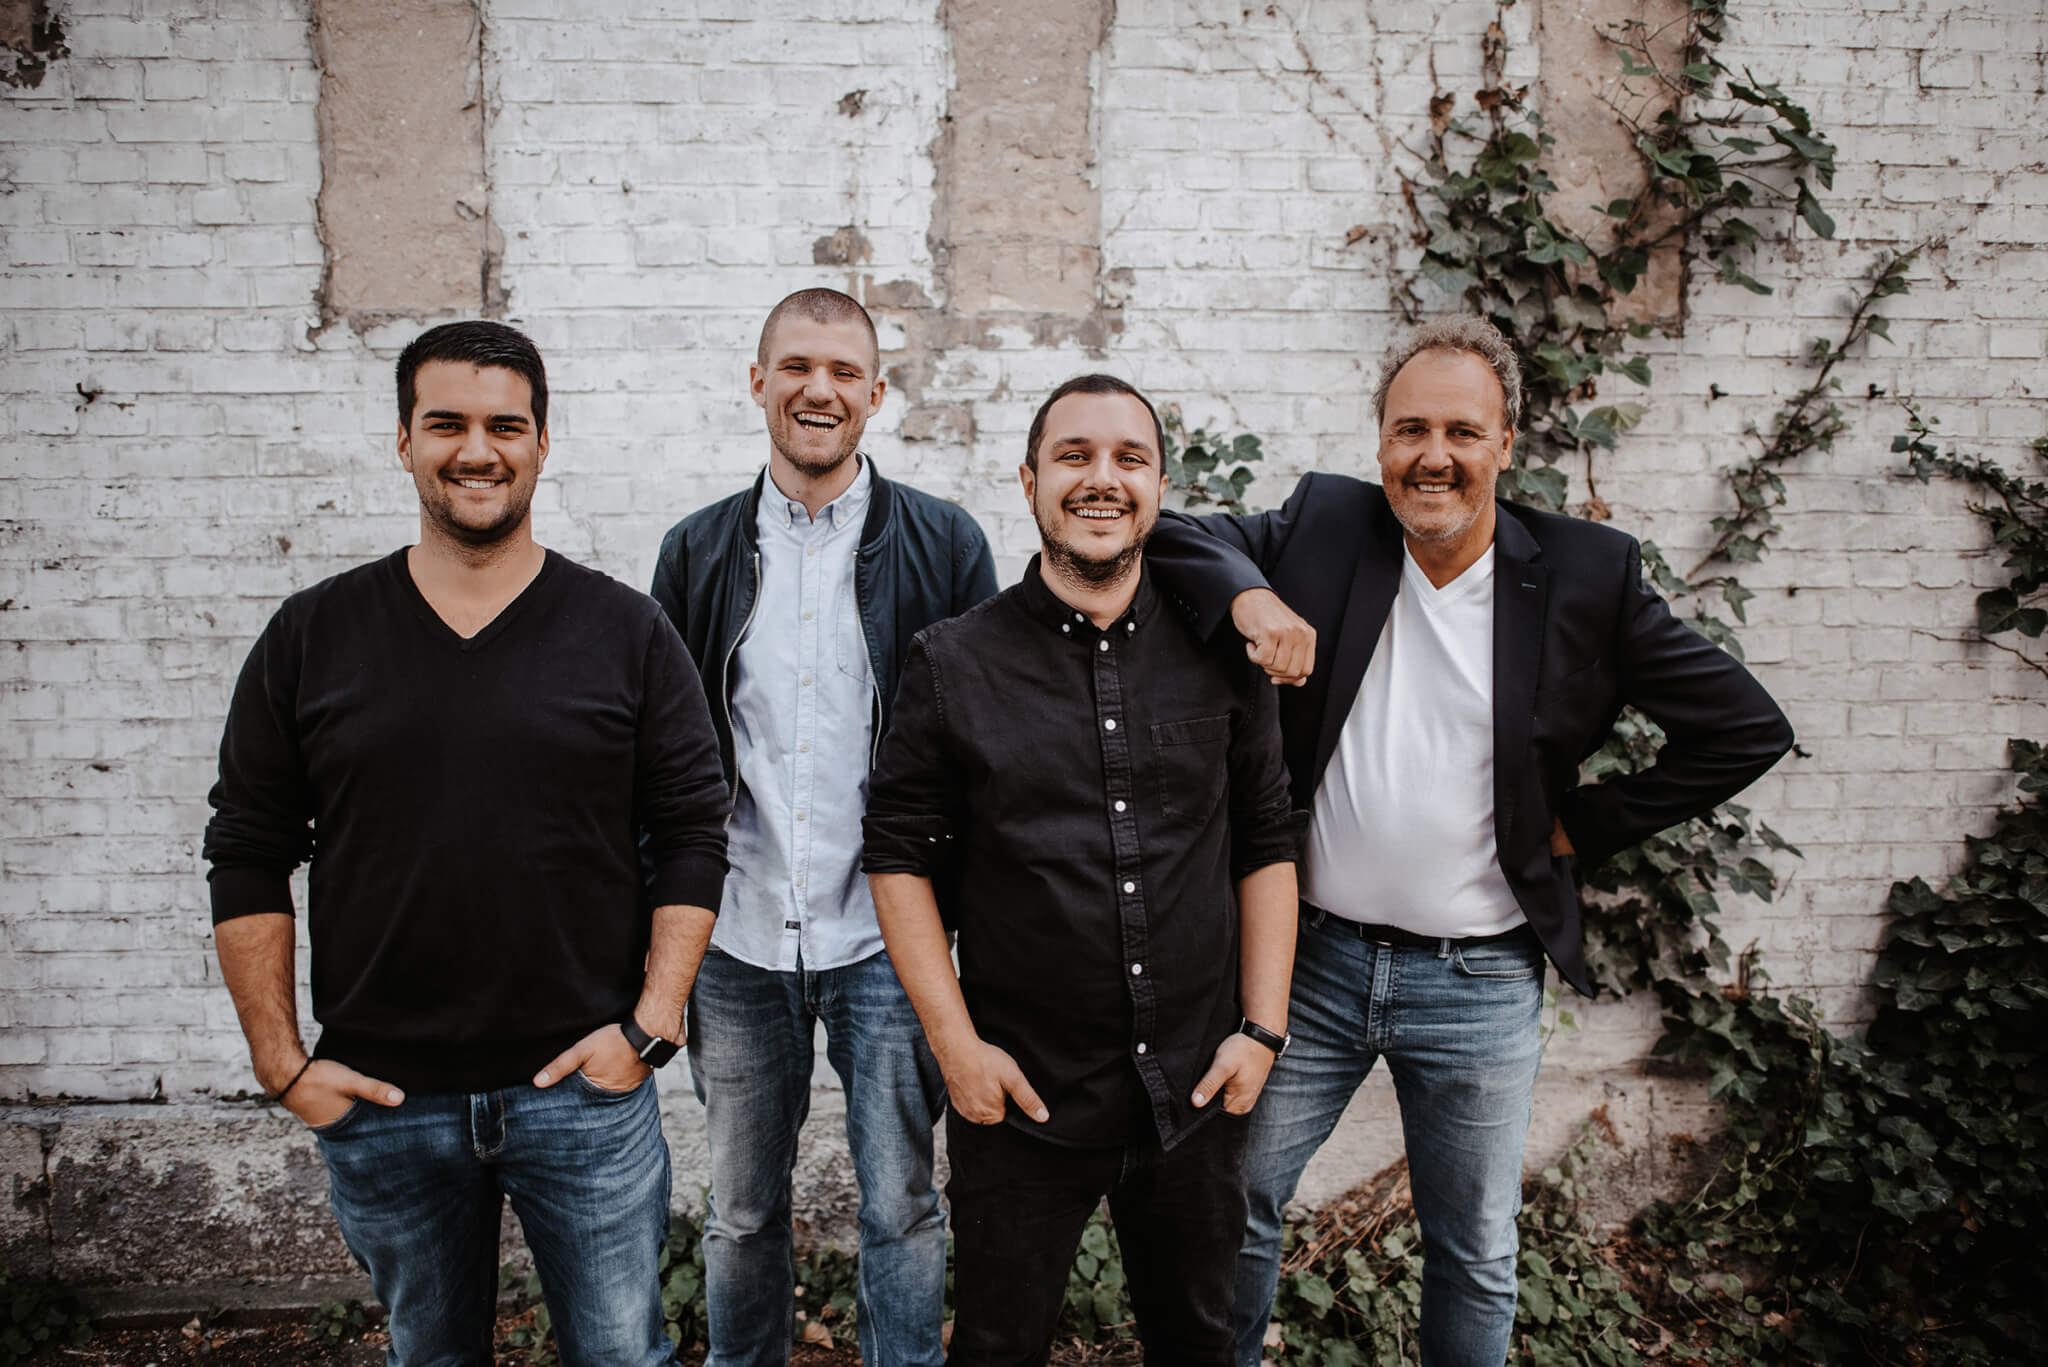 Timo Tchoulah, Paul Rittmeyer, Babak Khosrawi-Rad, York Schlüter